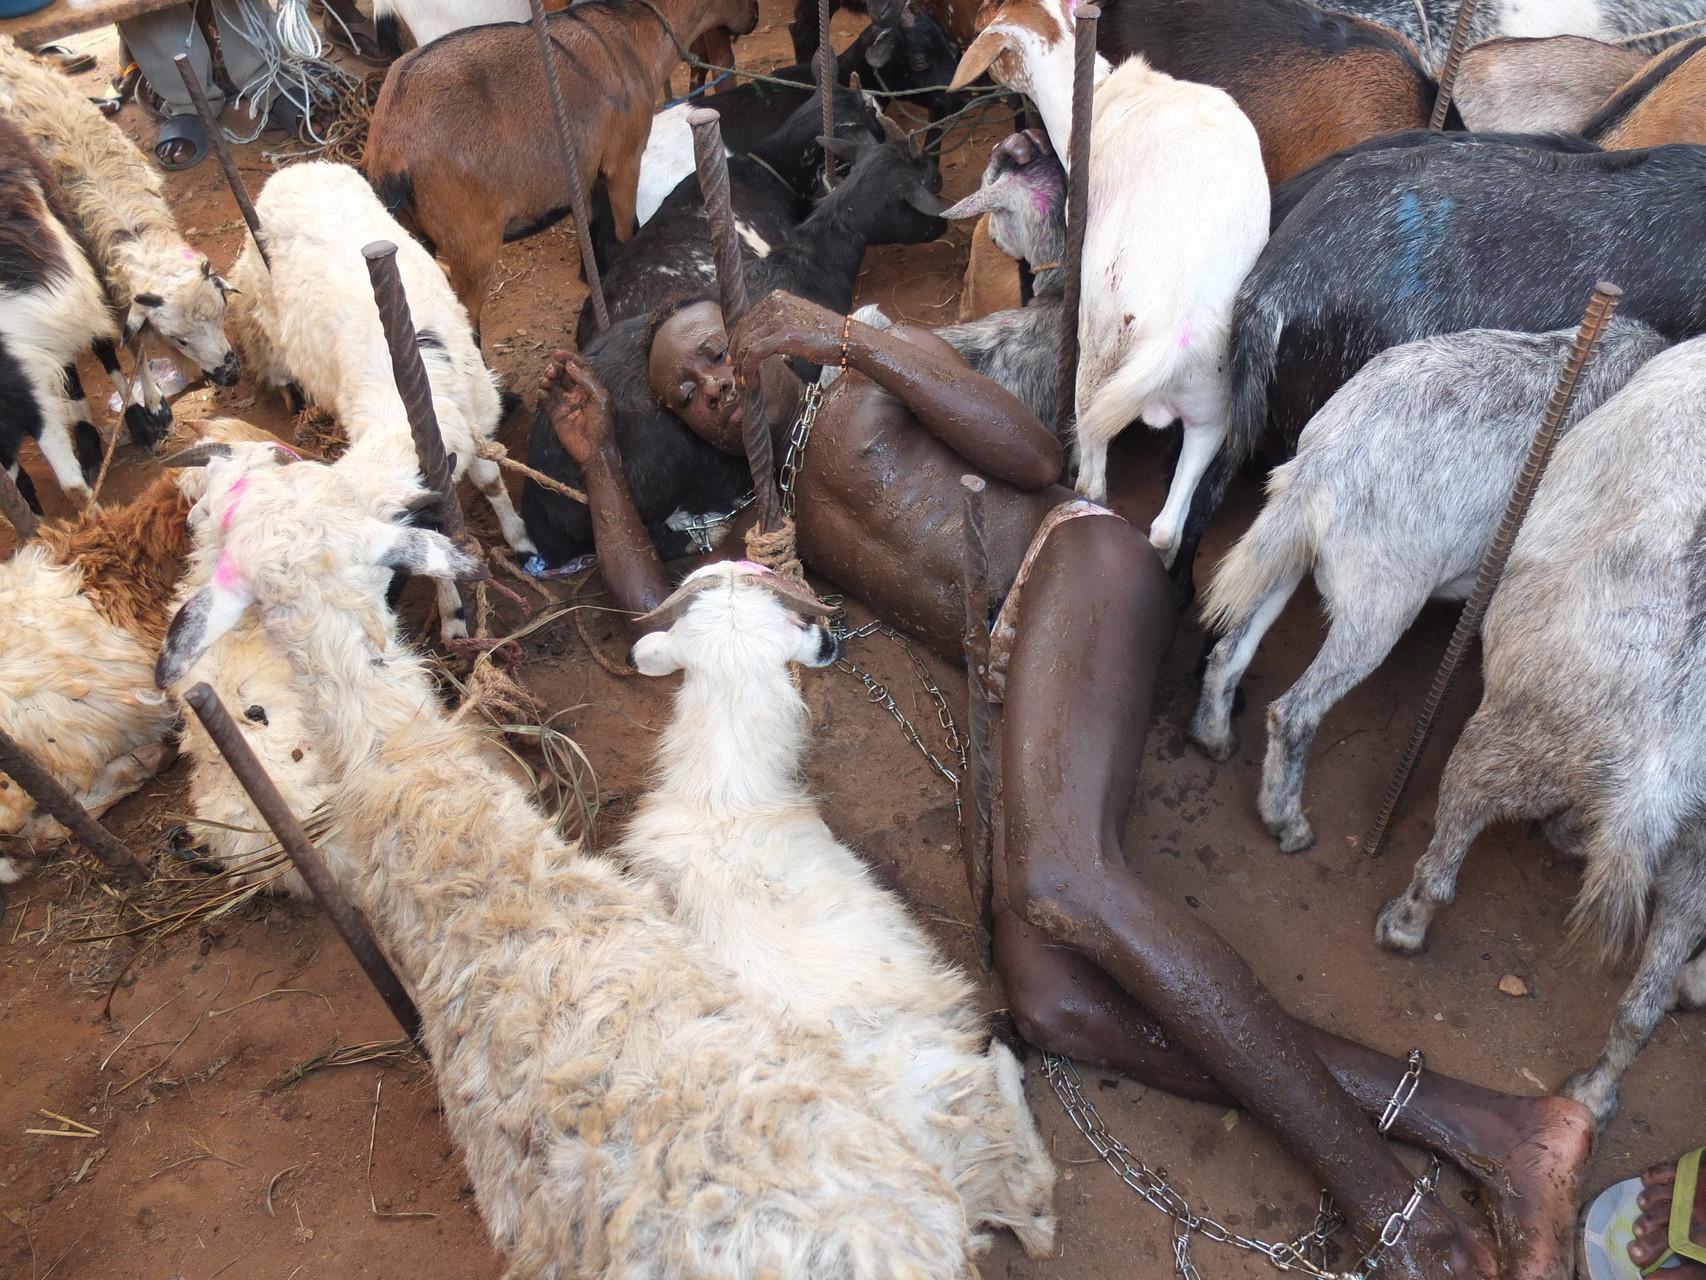 Gbugbordzi, 2014, Gbossime, Lome, Togo (Image credit: Natascia Silverio)